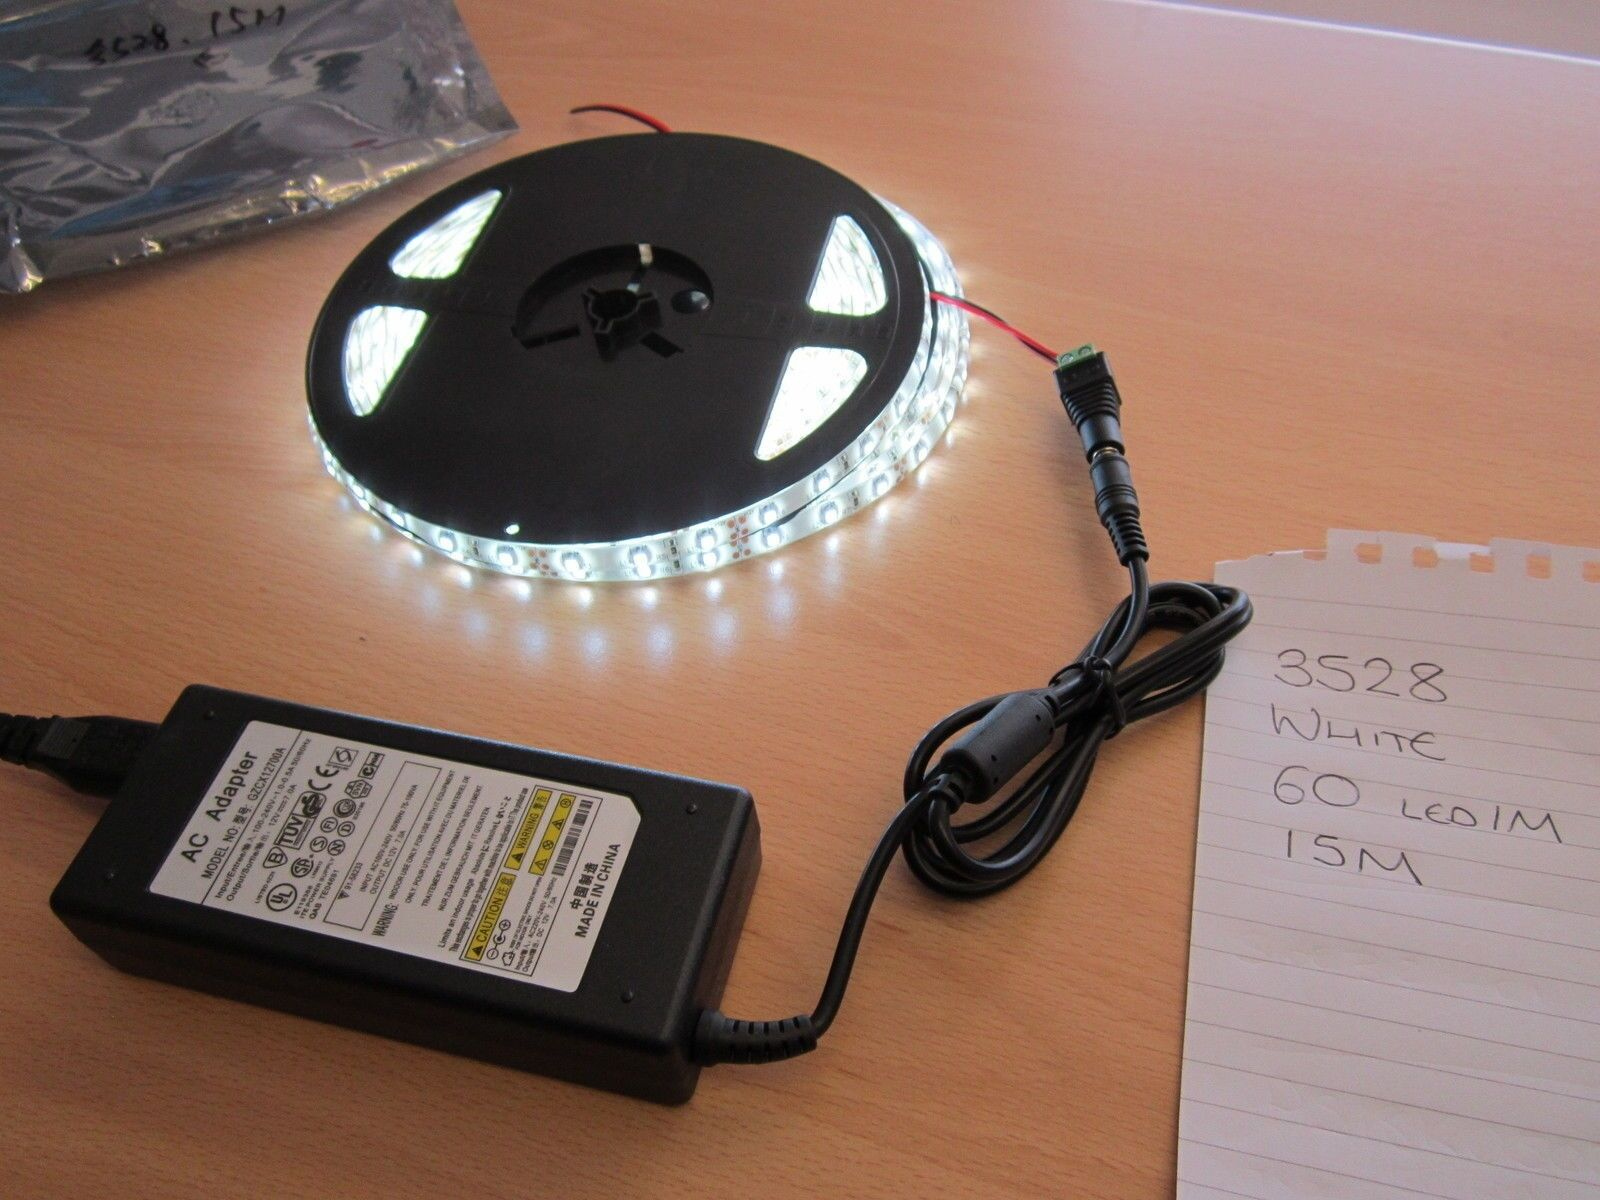 15M Waterproof Indoor Outdoor Adhesive Bright Weiß 3528 LED Light Strip